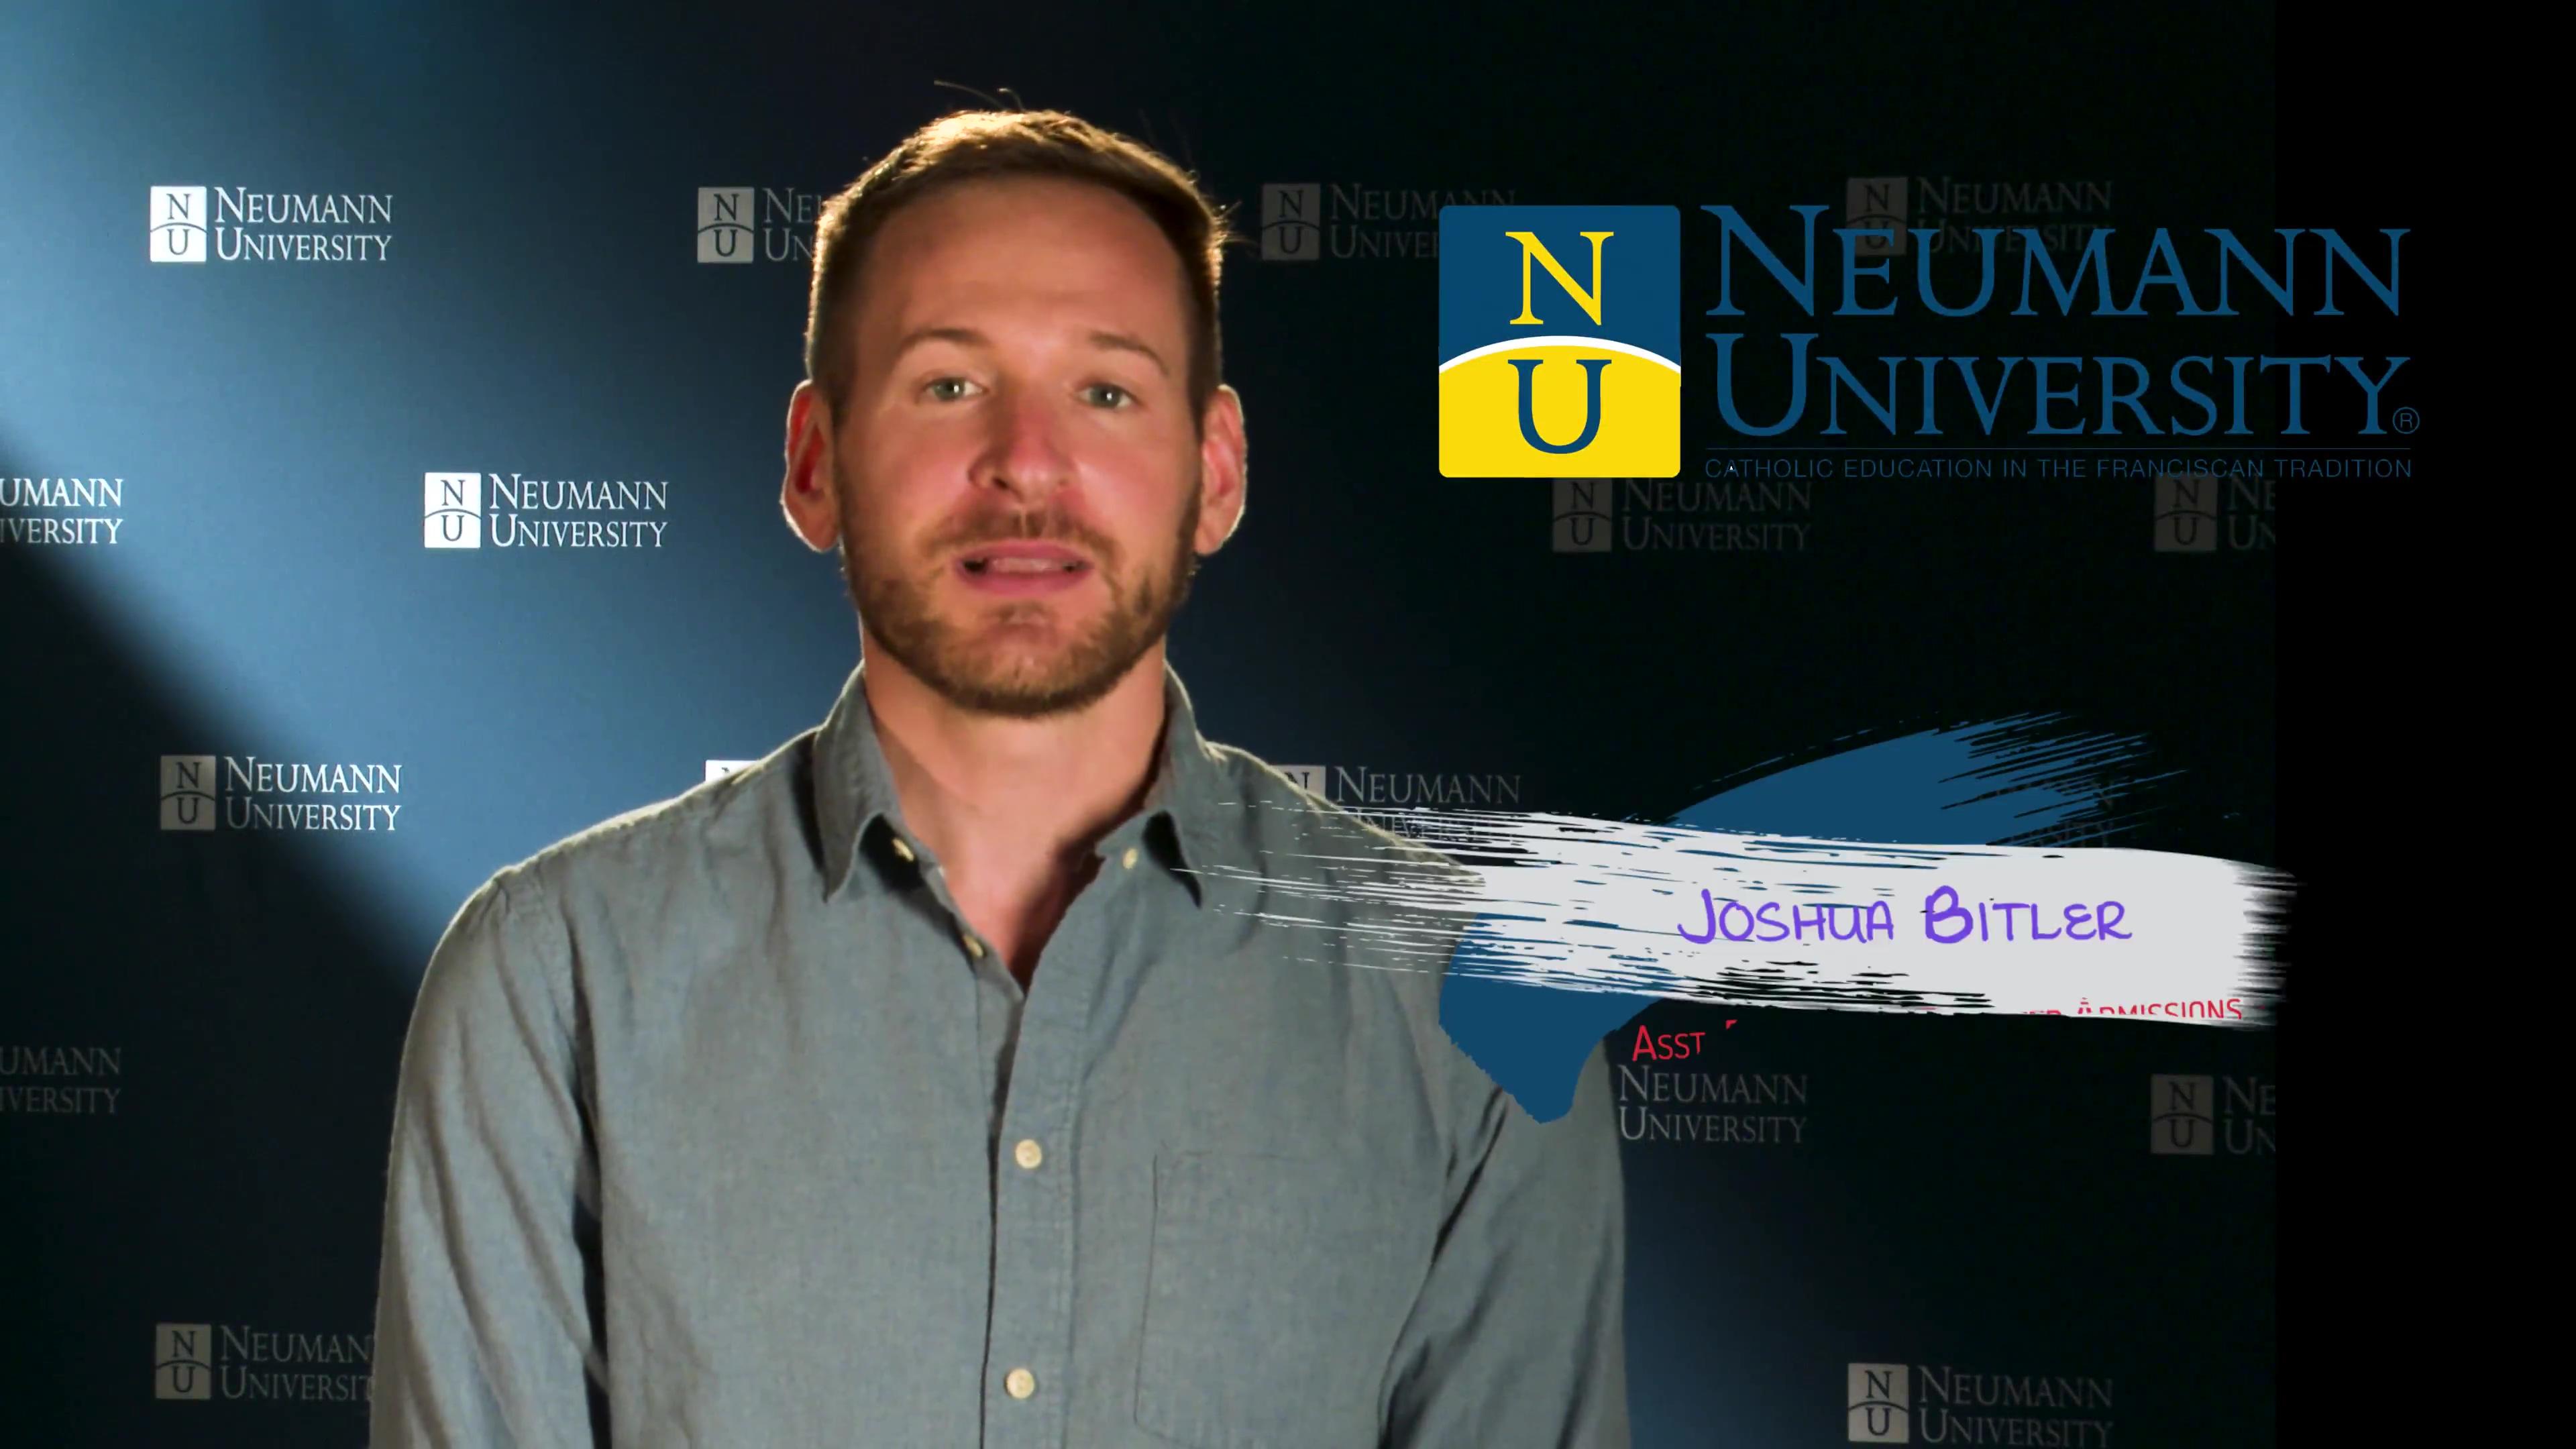 Neumann University - Assistant Director of Transfer Admissions Joshua Bitler